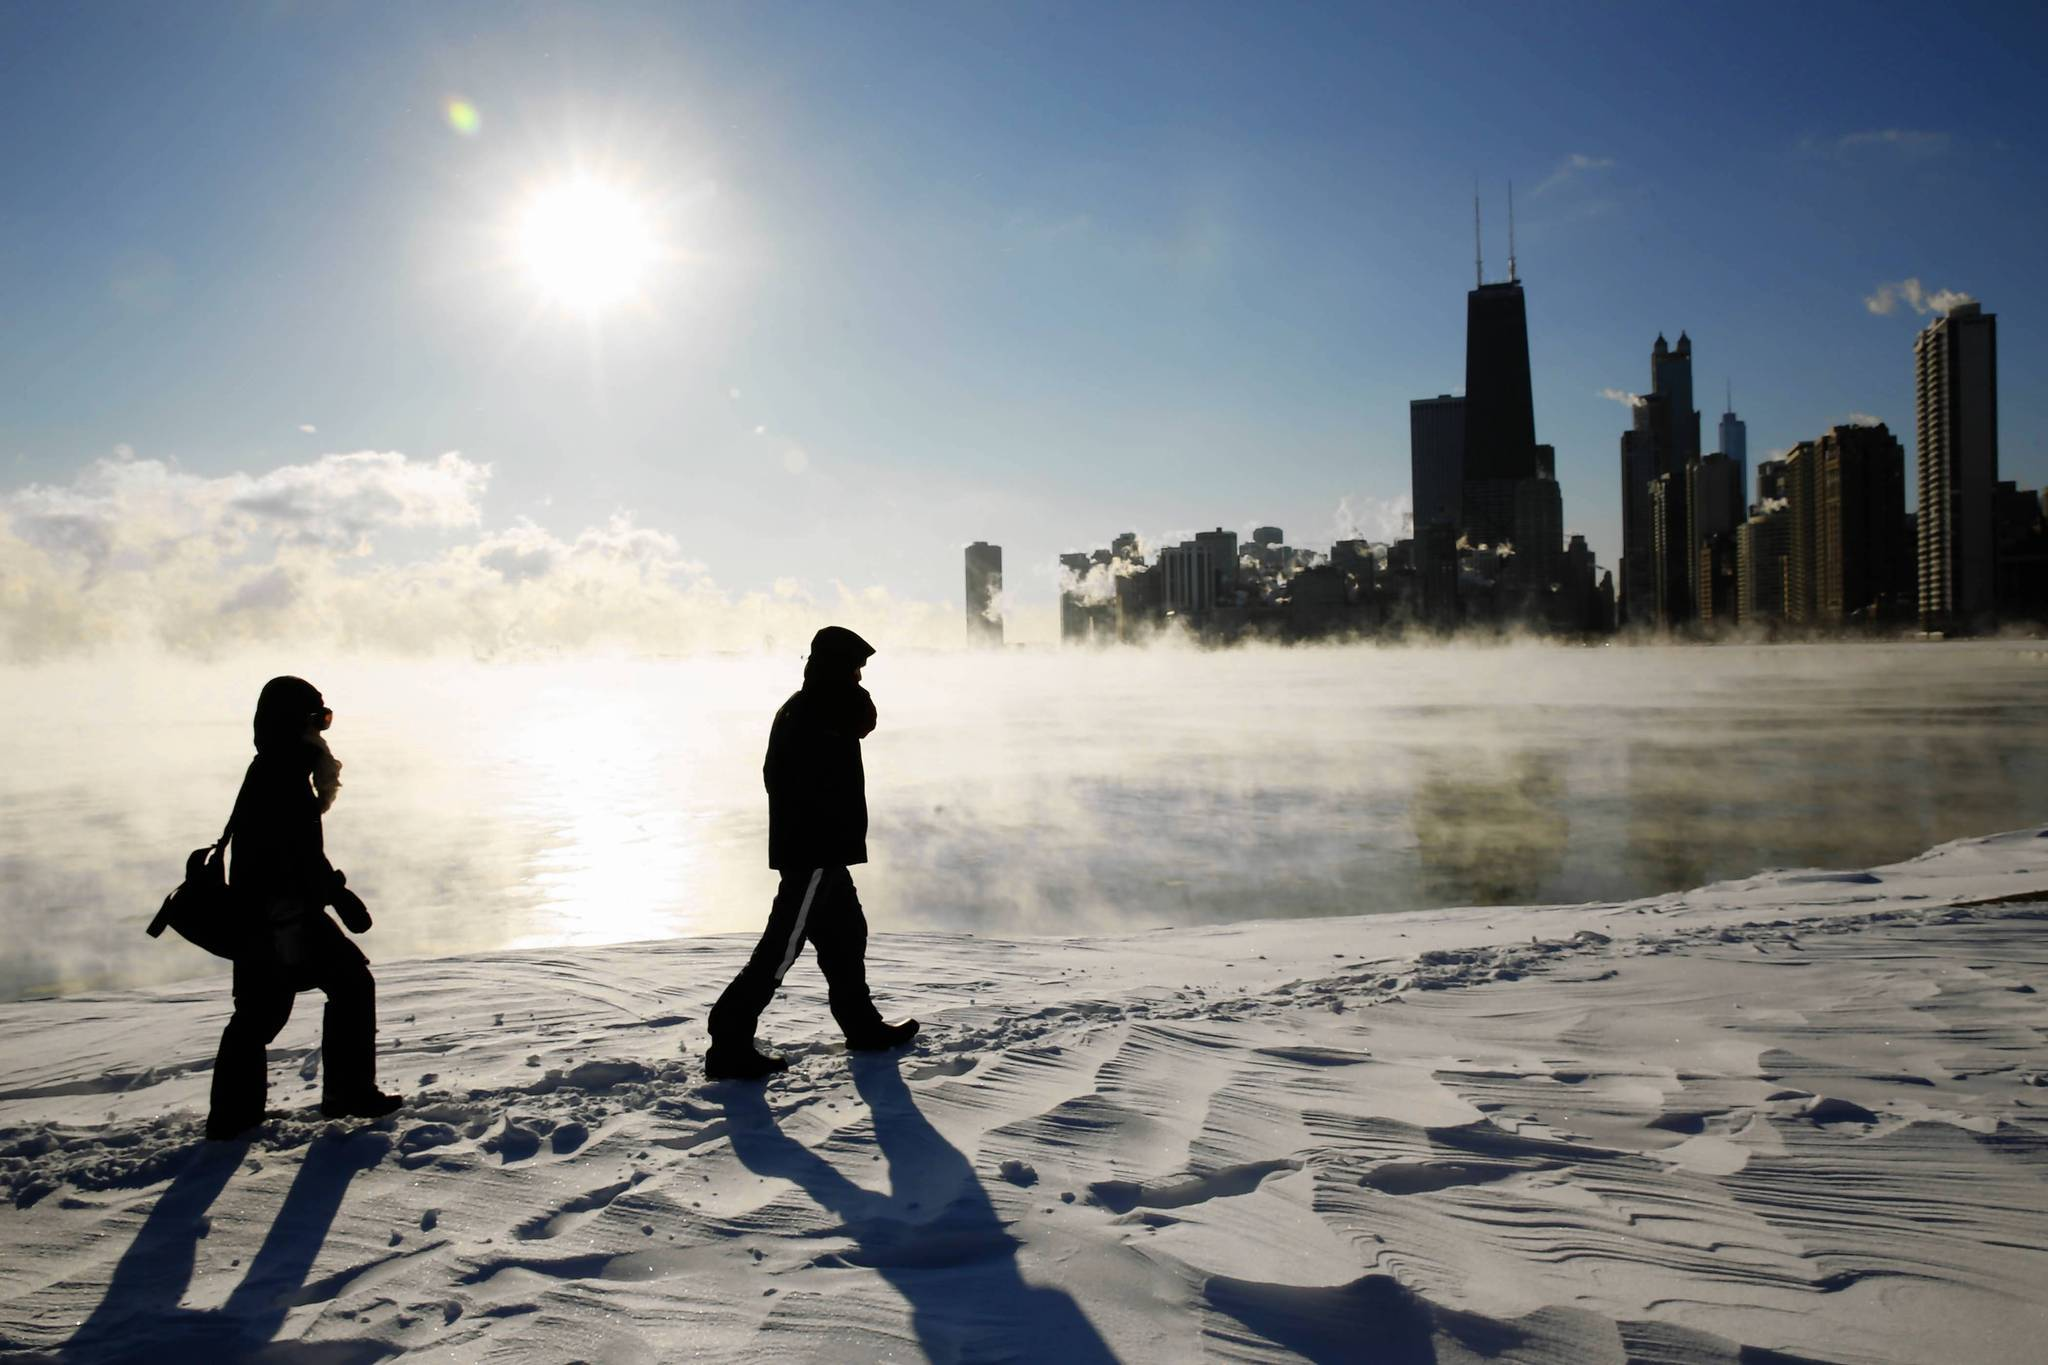 Snowstorms arrive as cold temperatures continue